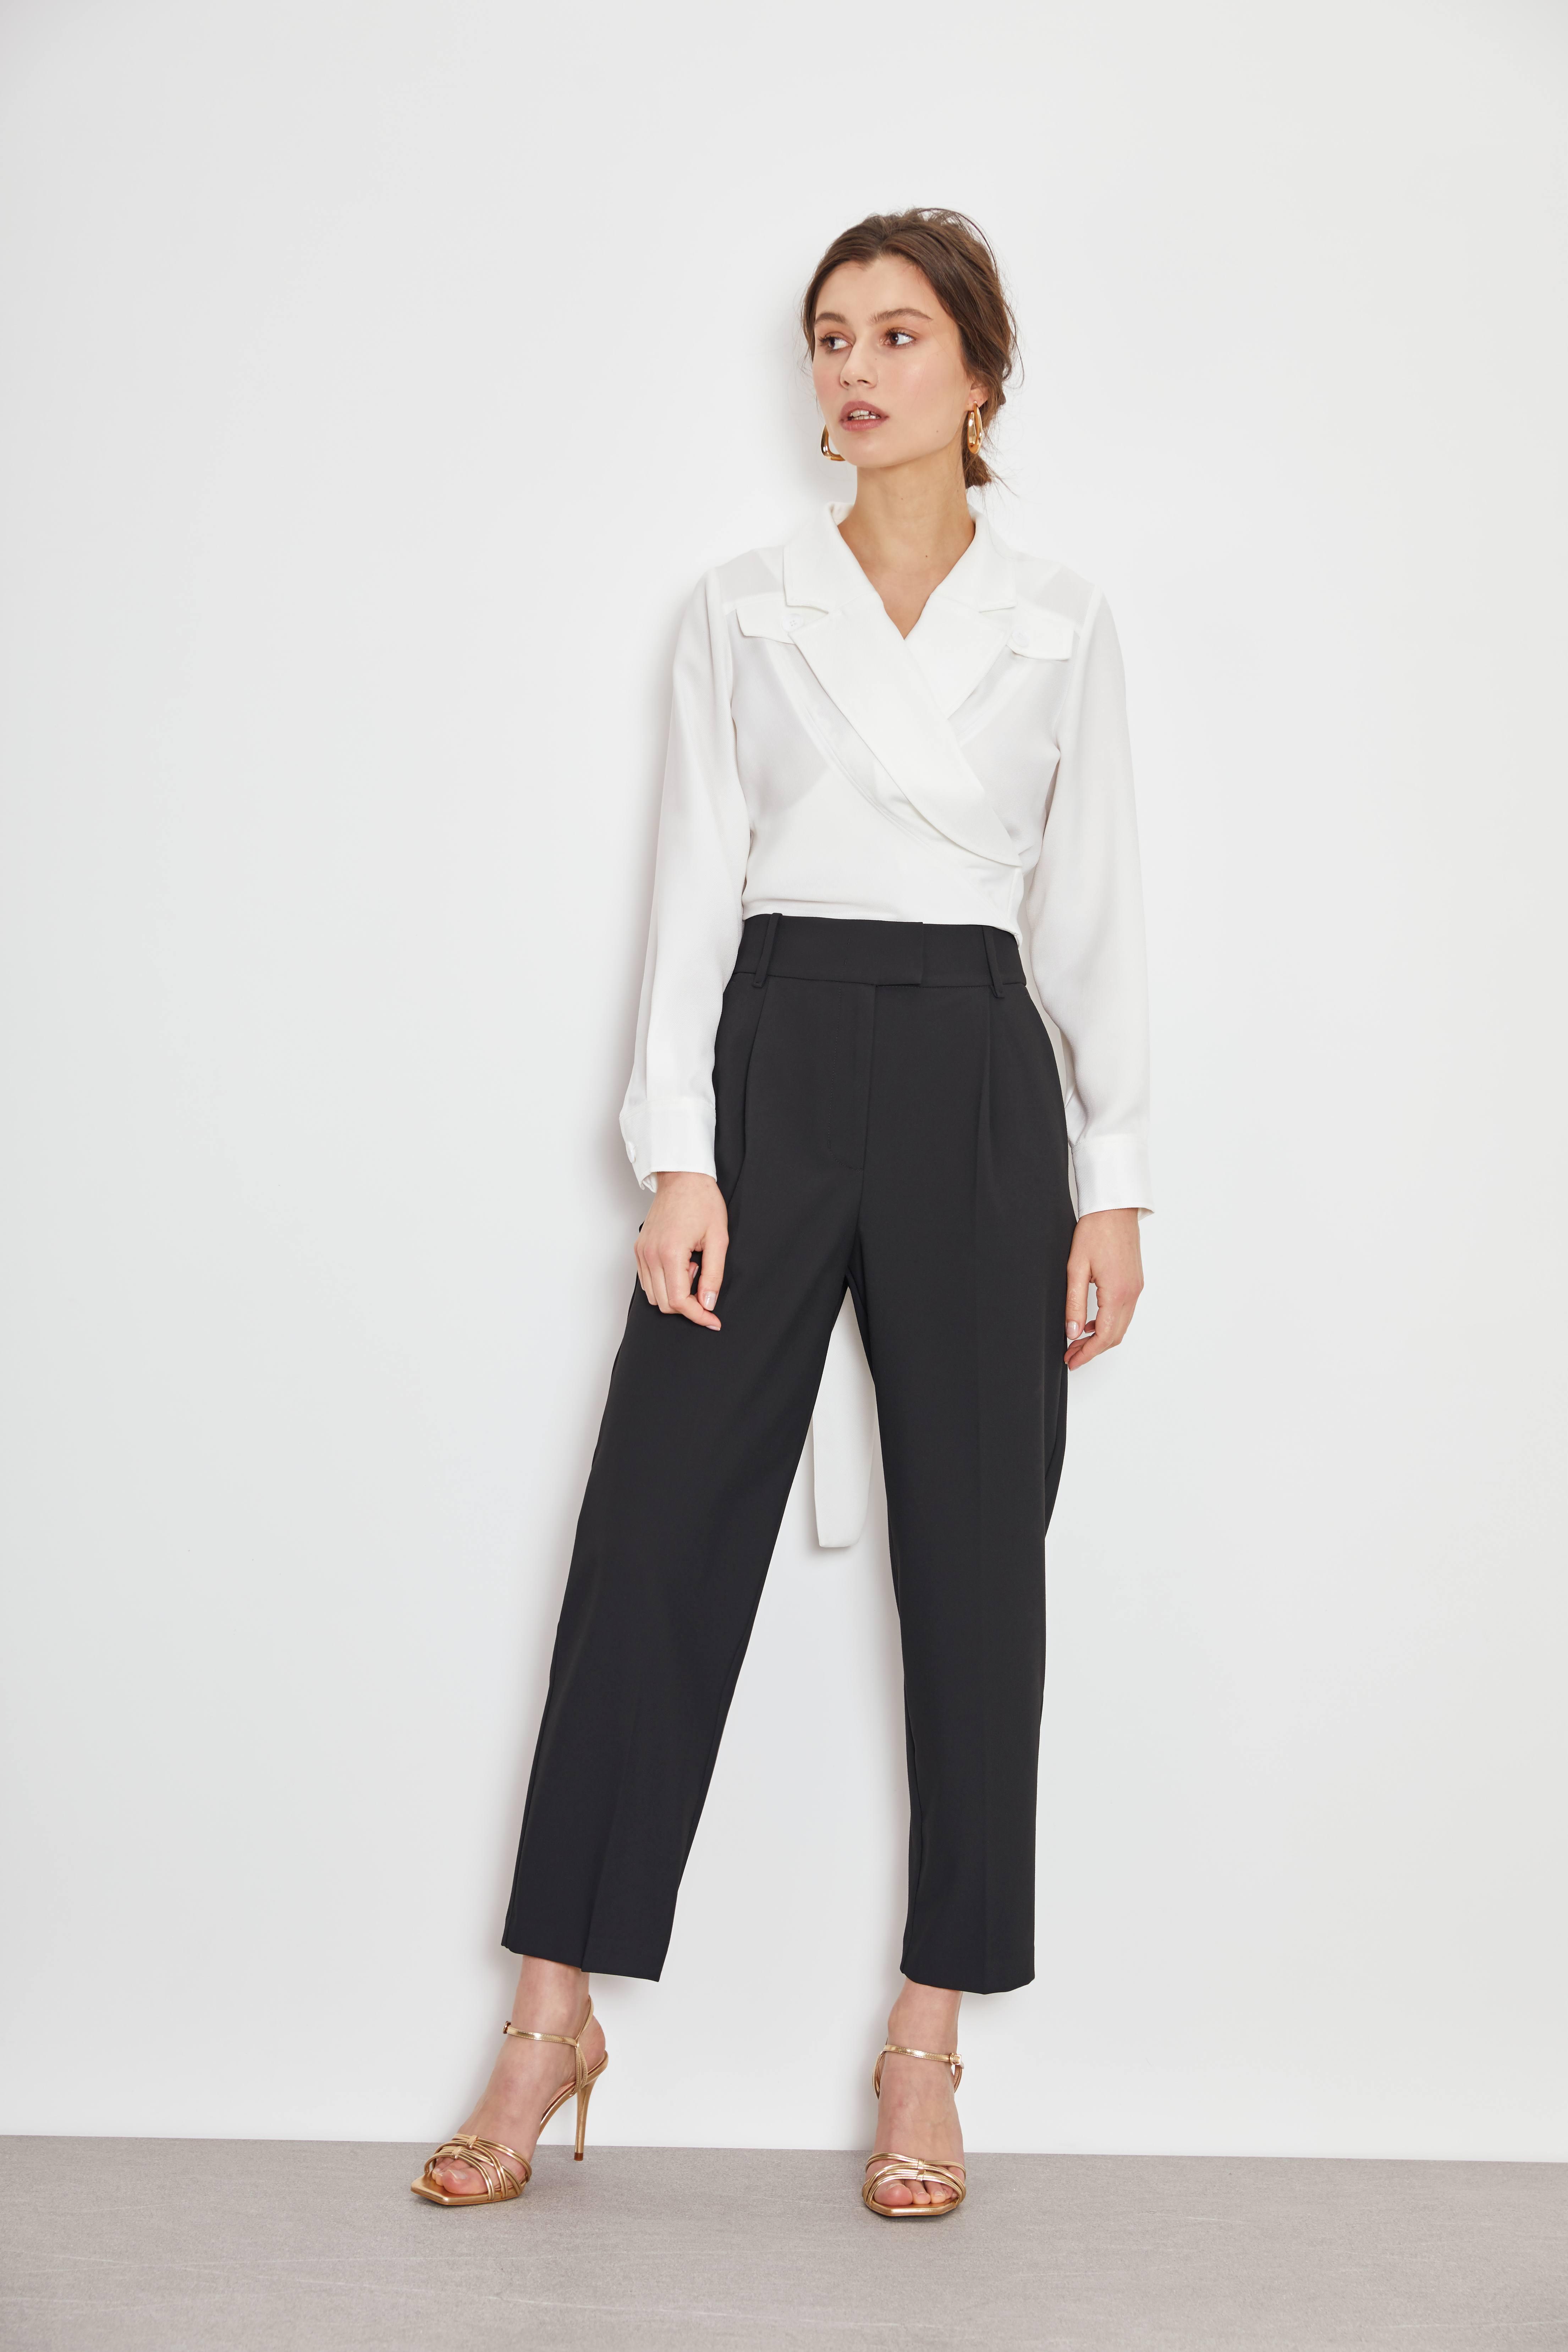 Блузка LIME Блузка с запáхом блузка lime блузка с эластичной талией